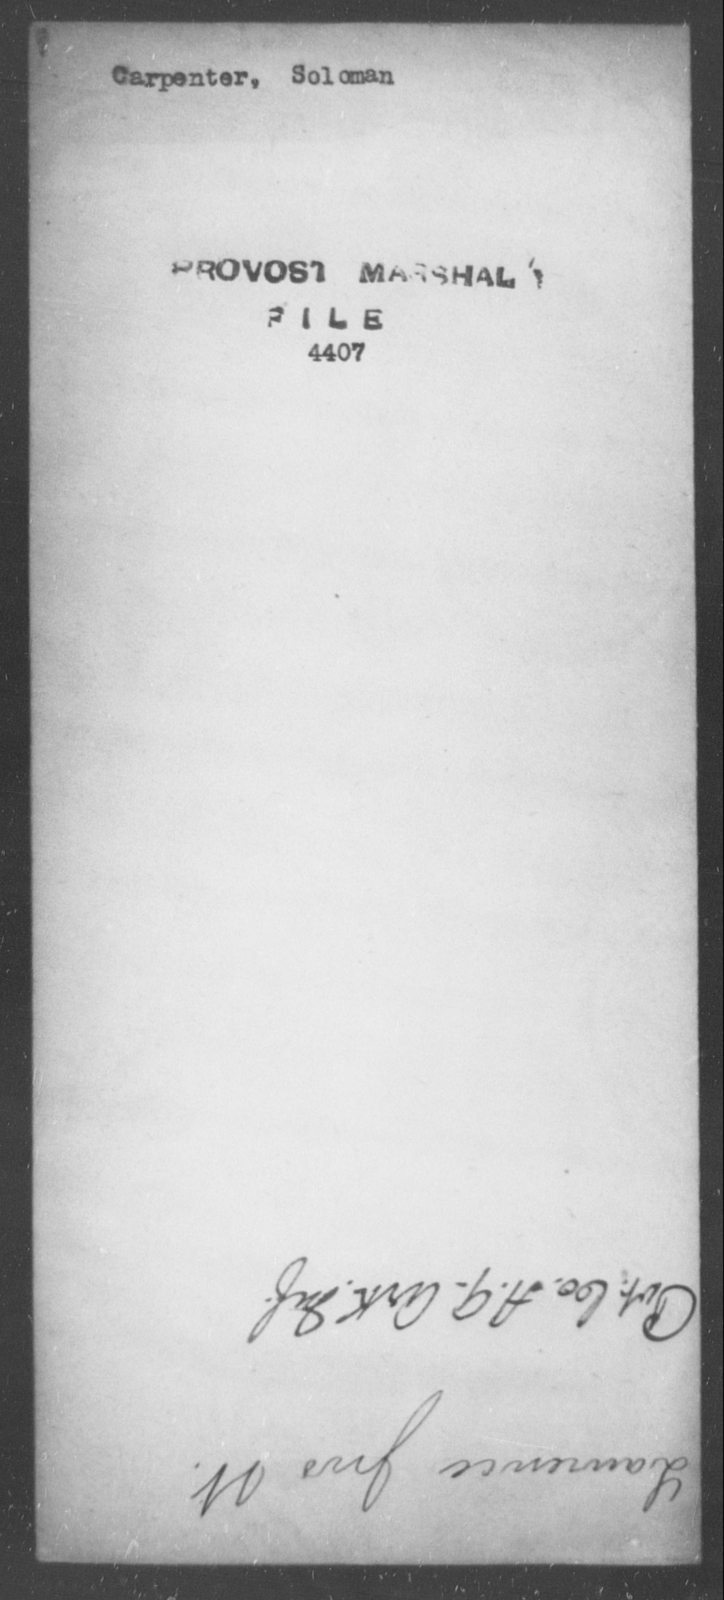 Carpenter, Soloman - State: [Blank] - Year: [Blank] | U S  National